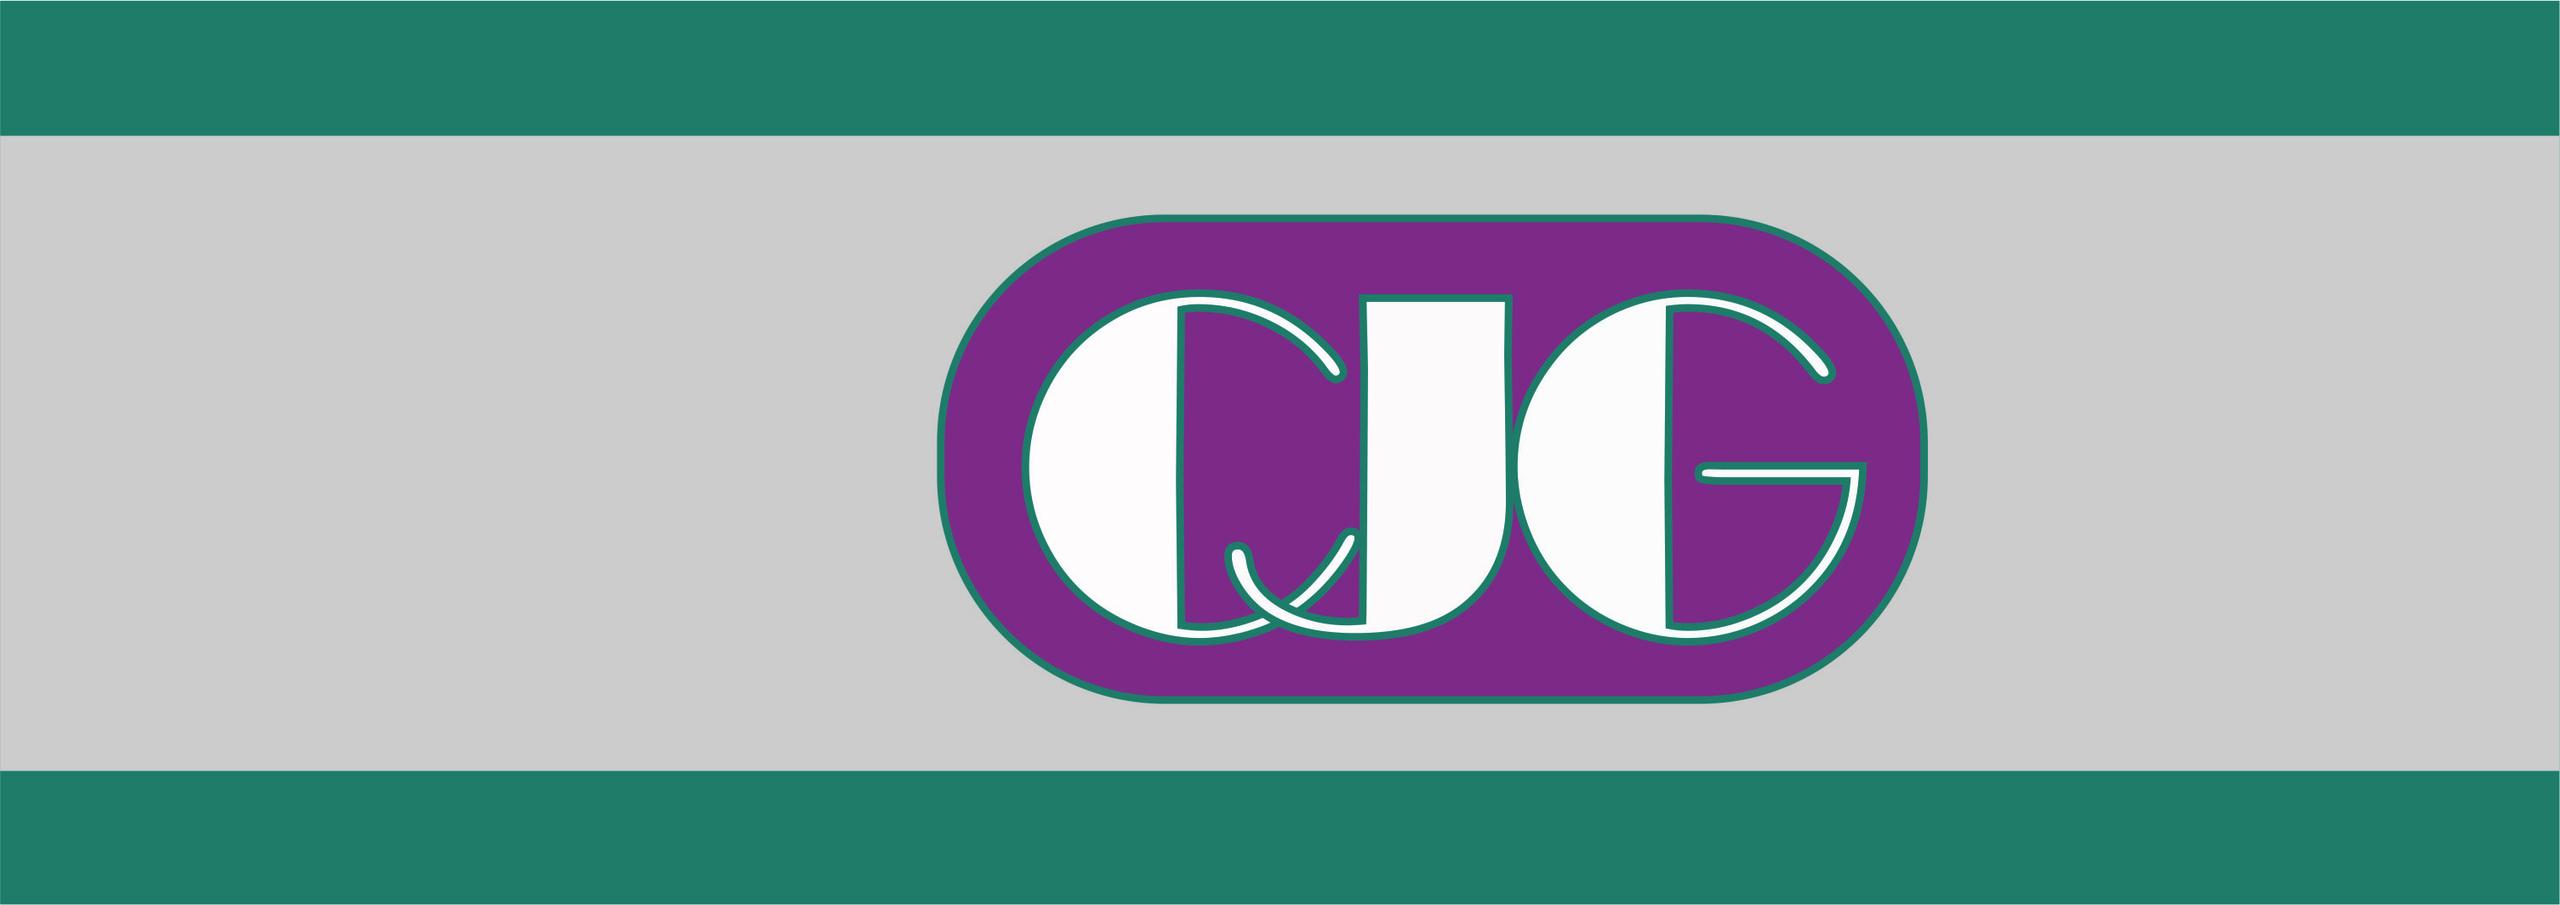 CJG (@cgj_atonstar) Cover Image